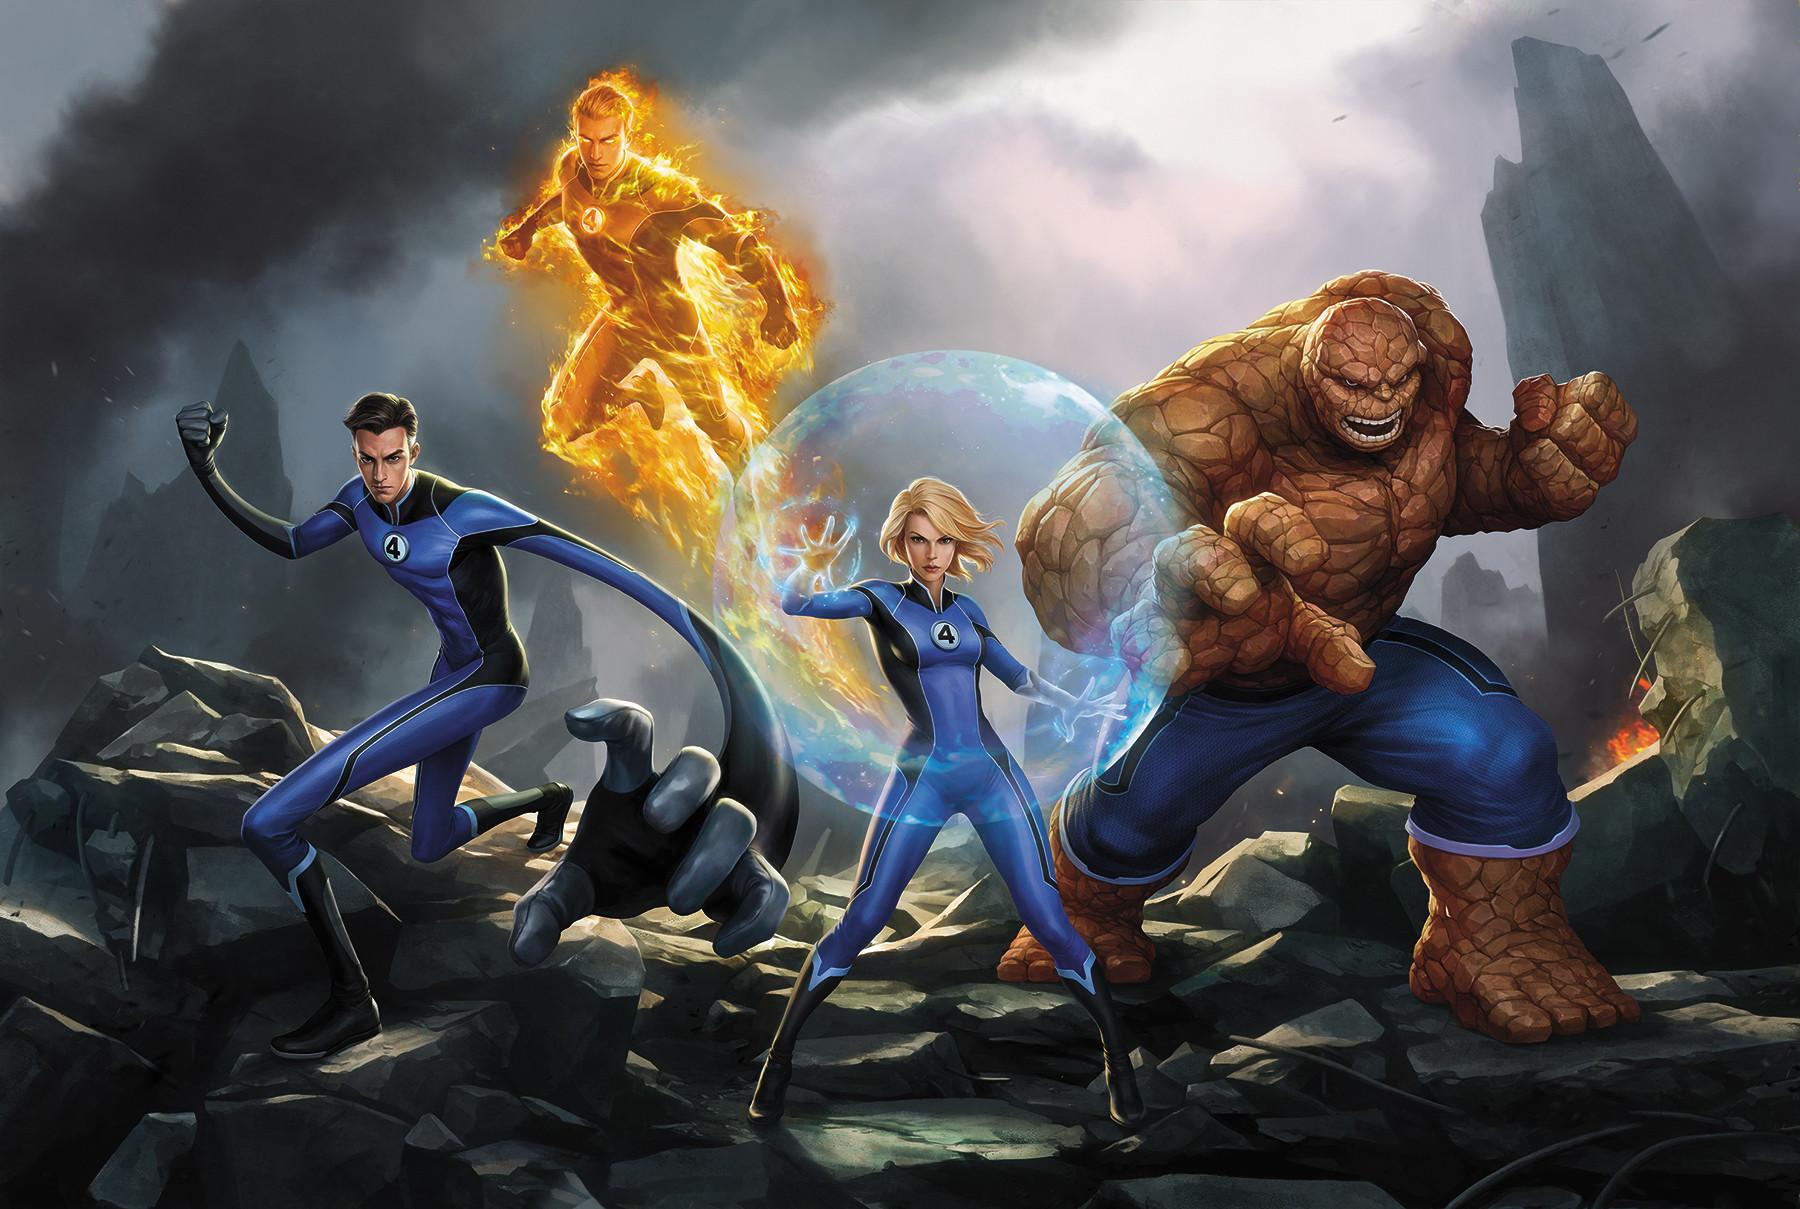 Marvel_Fantastic4_By YinYuming.jpg